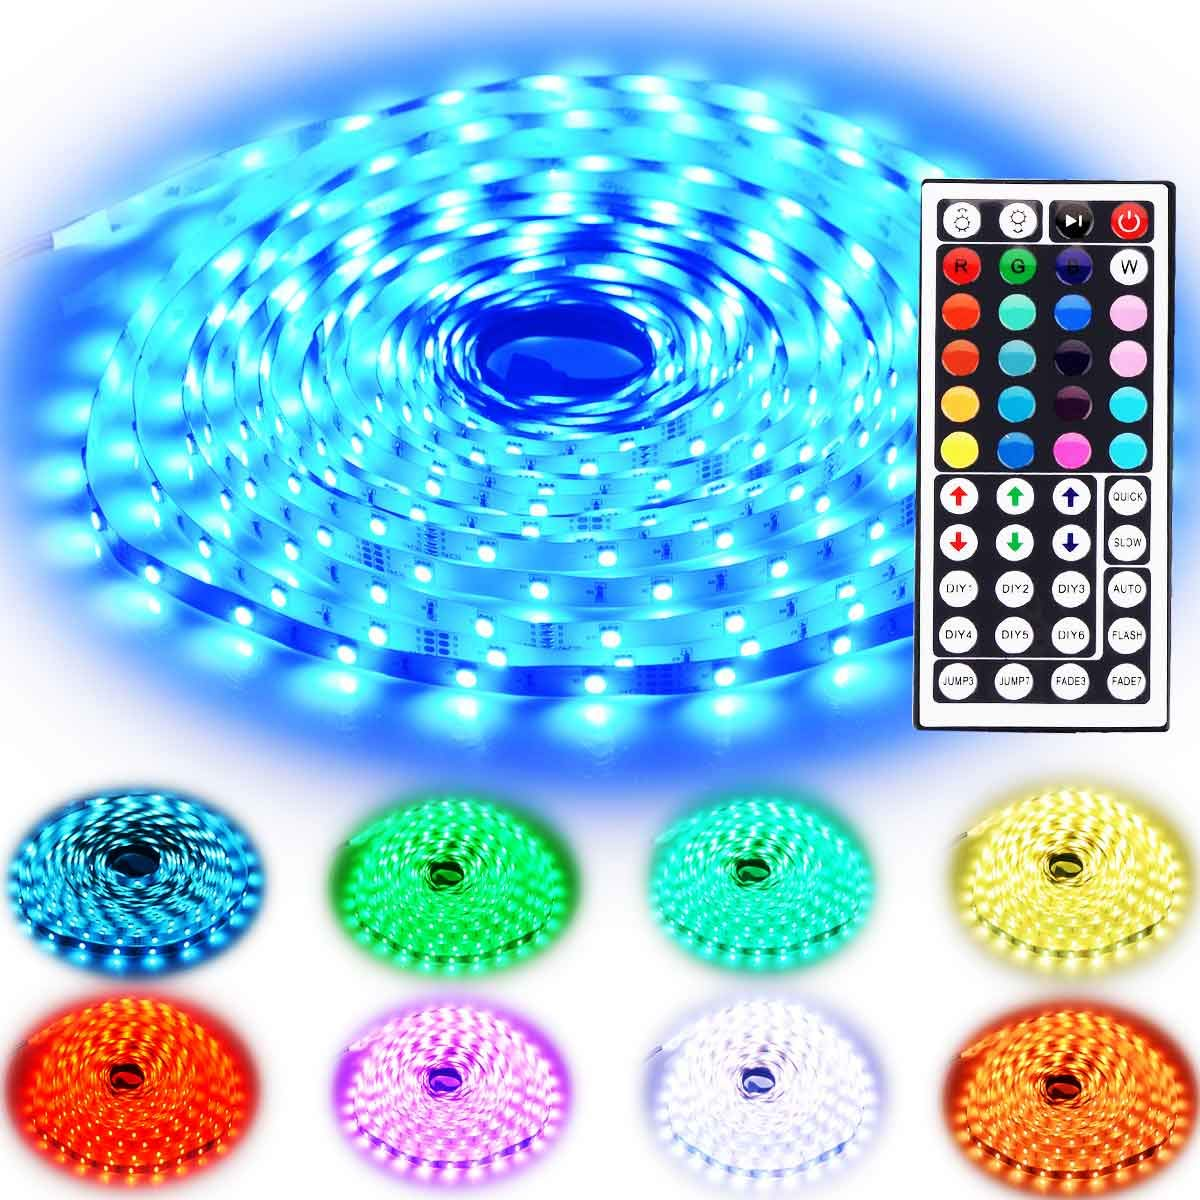 Rxment RGB LED Strip Lights with Remote 10M 32.8 Ft 5050 RGB 300LEDs Full Kit, Blue LED Light Strip, LED Lights Strip, LED Night Light, LED Christmas Lights, LED Rope Lights, LED Tape Light